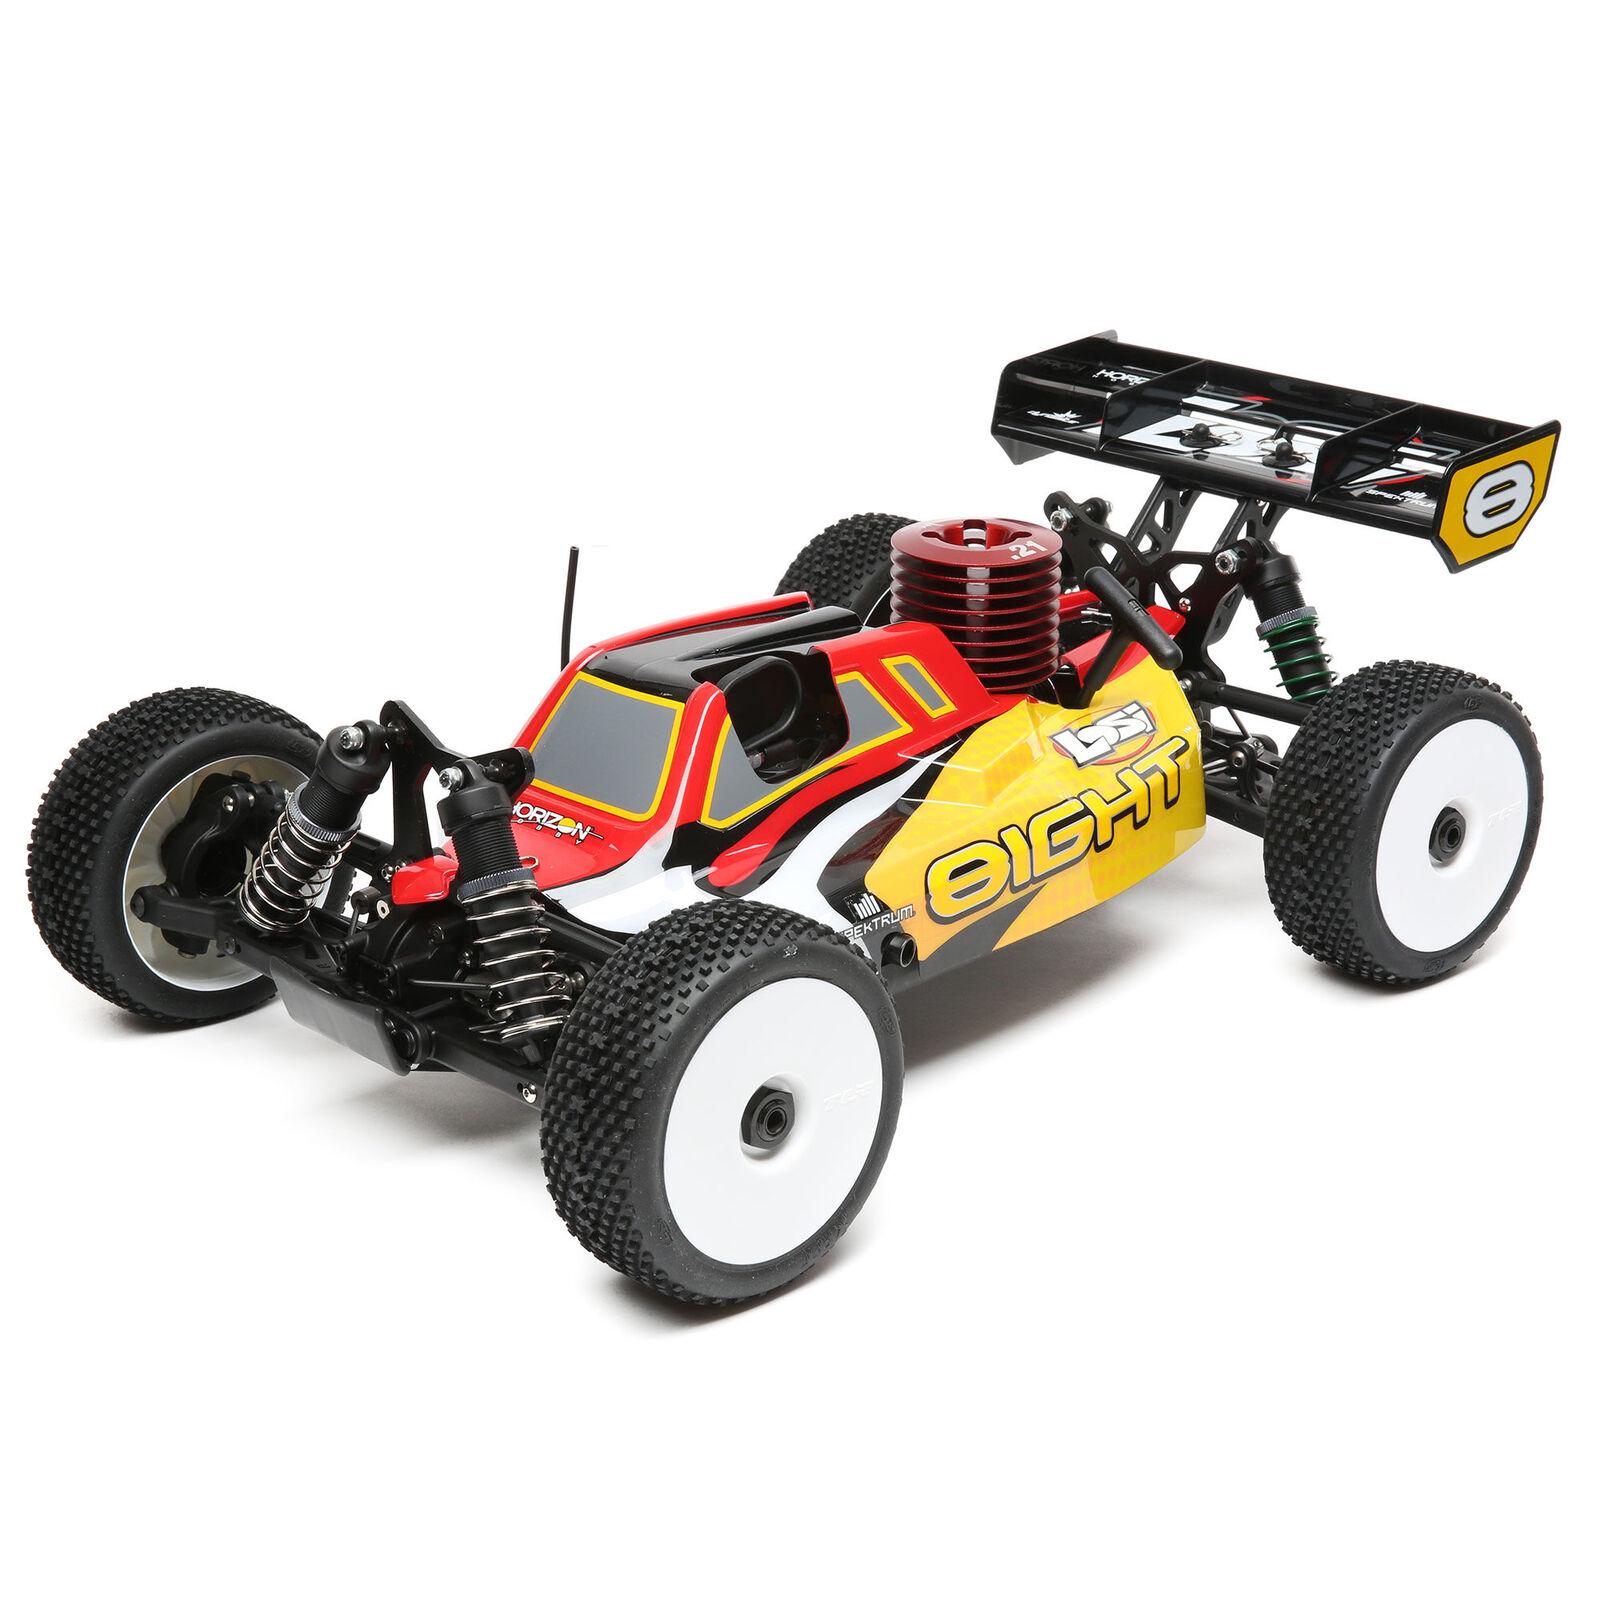 8IGHT Nitro RTR: 1/8 4WD Buggy